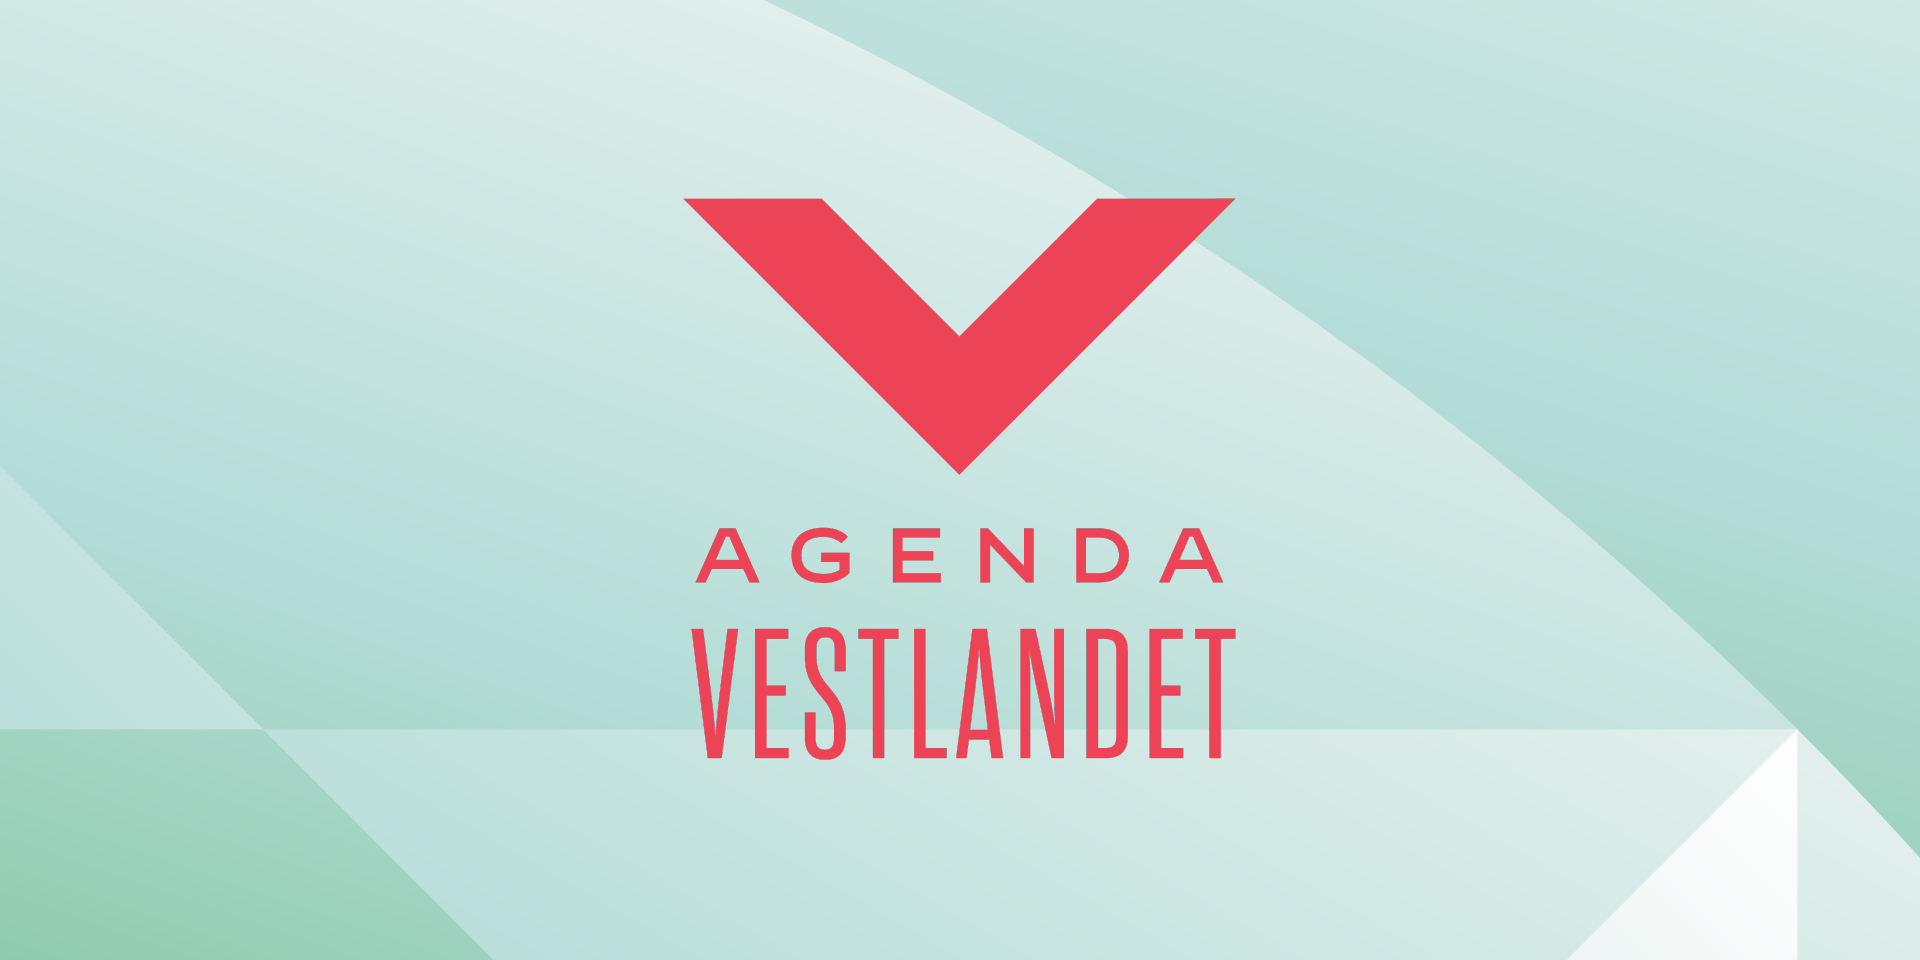 Agenda Vestlandet